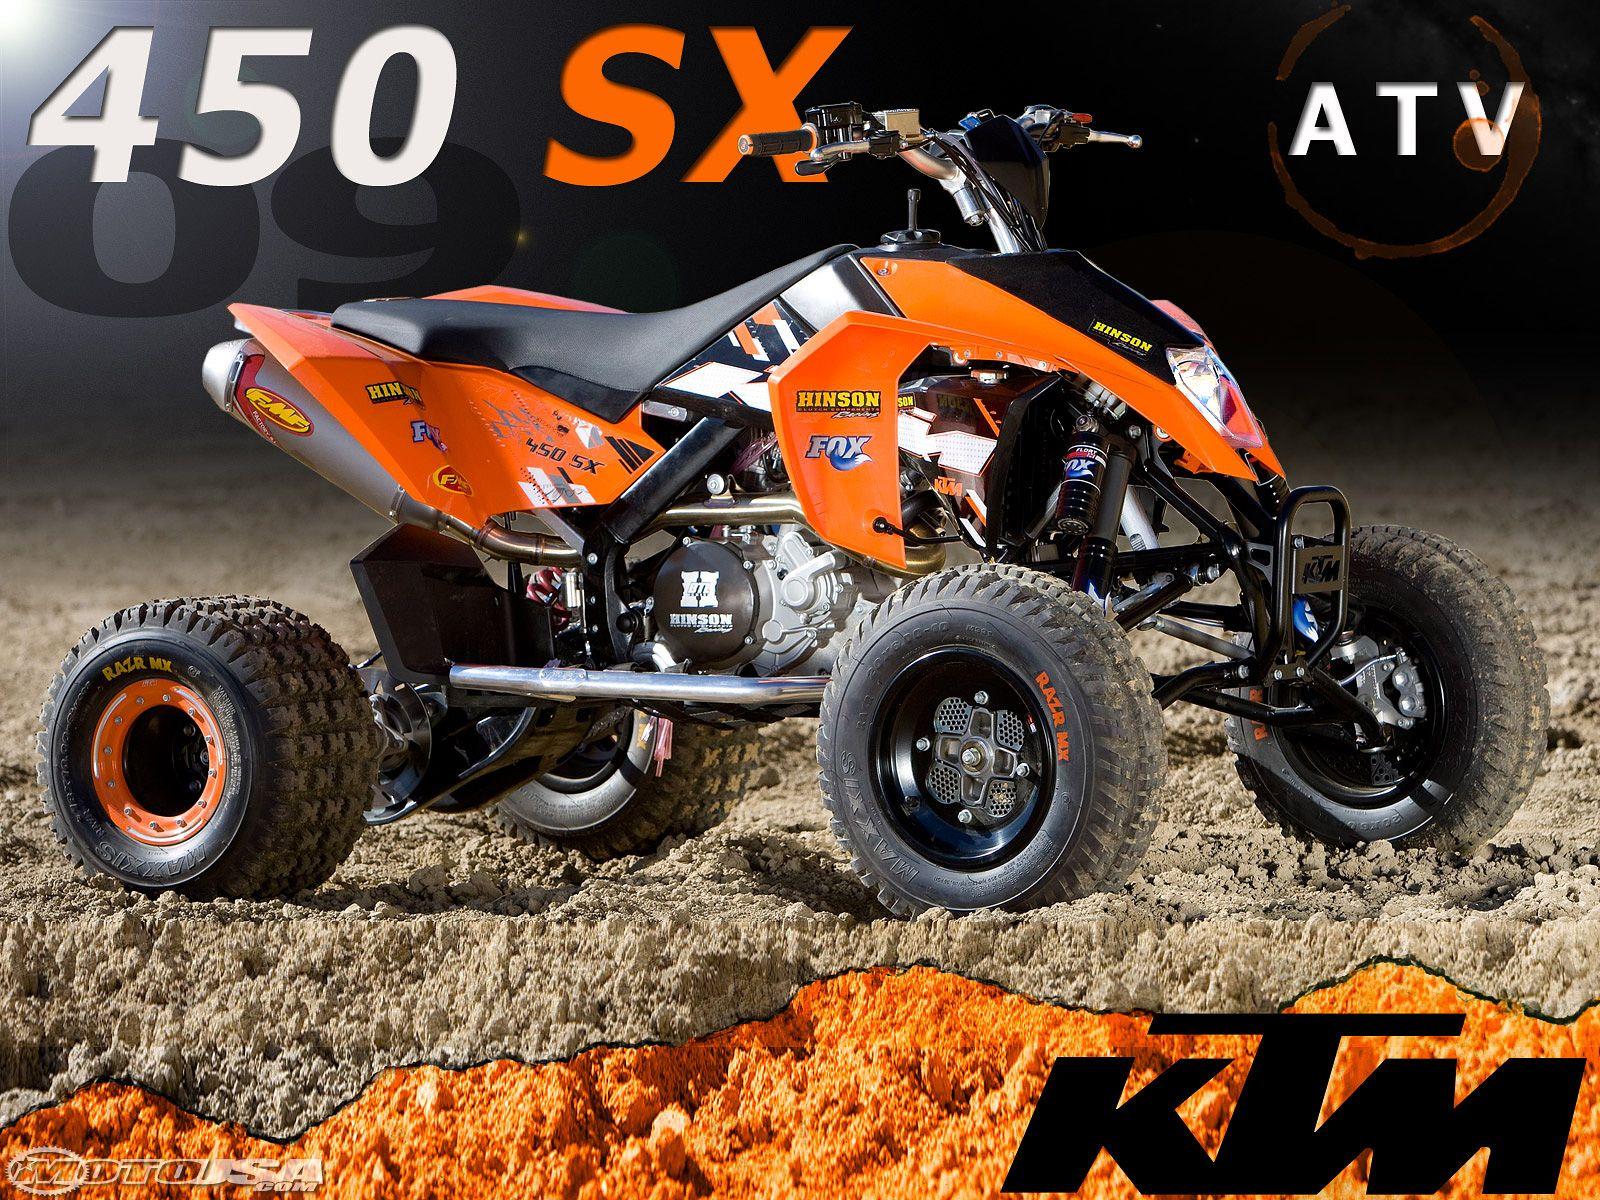 09 Ktm 450sx Atv Title Jpg 1600 1200 Atv Motocross Atv Ktm